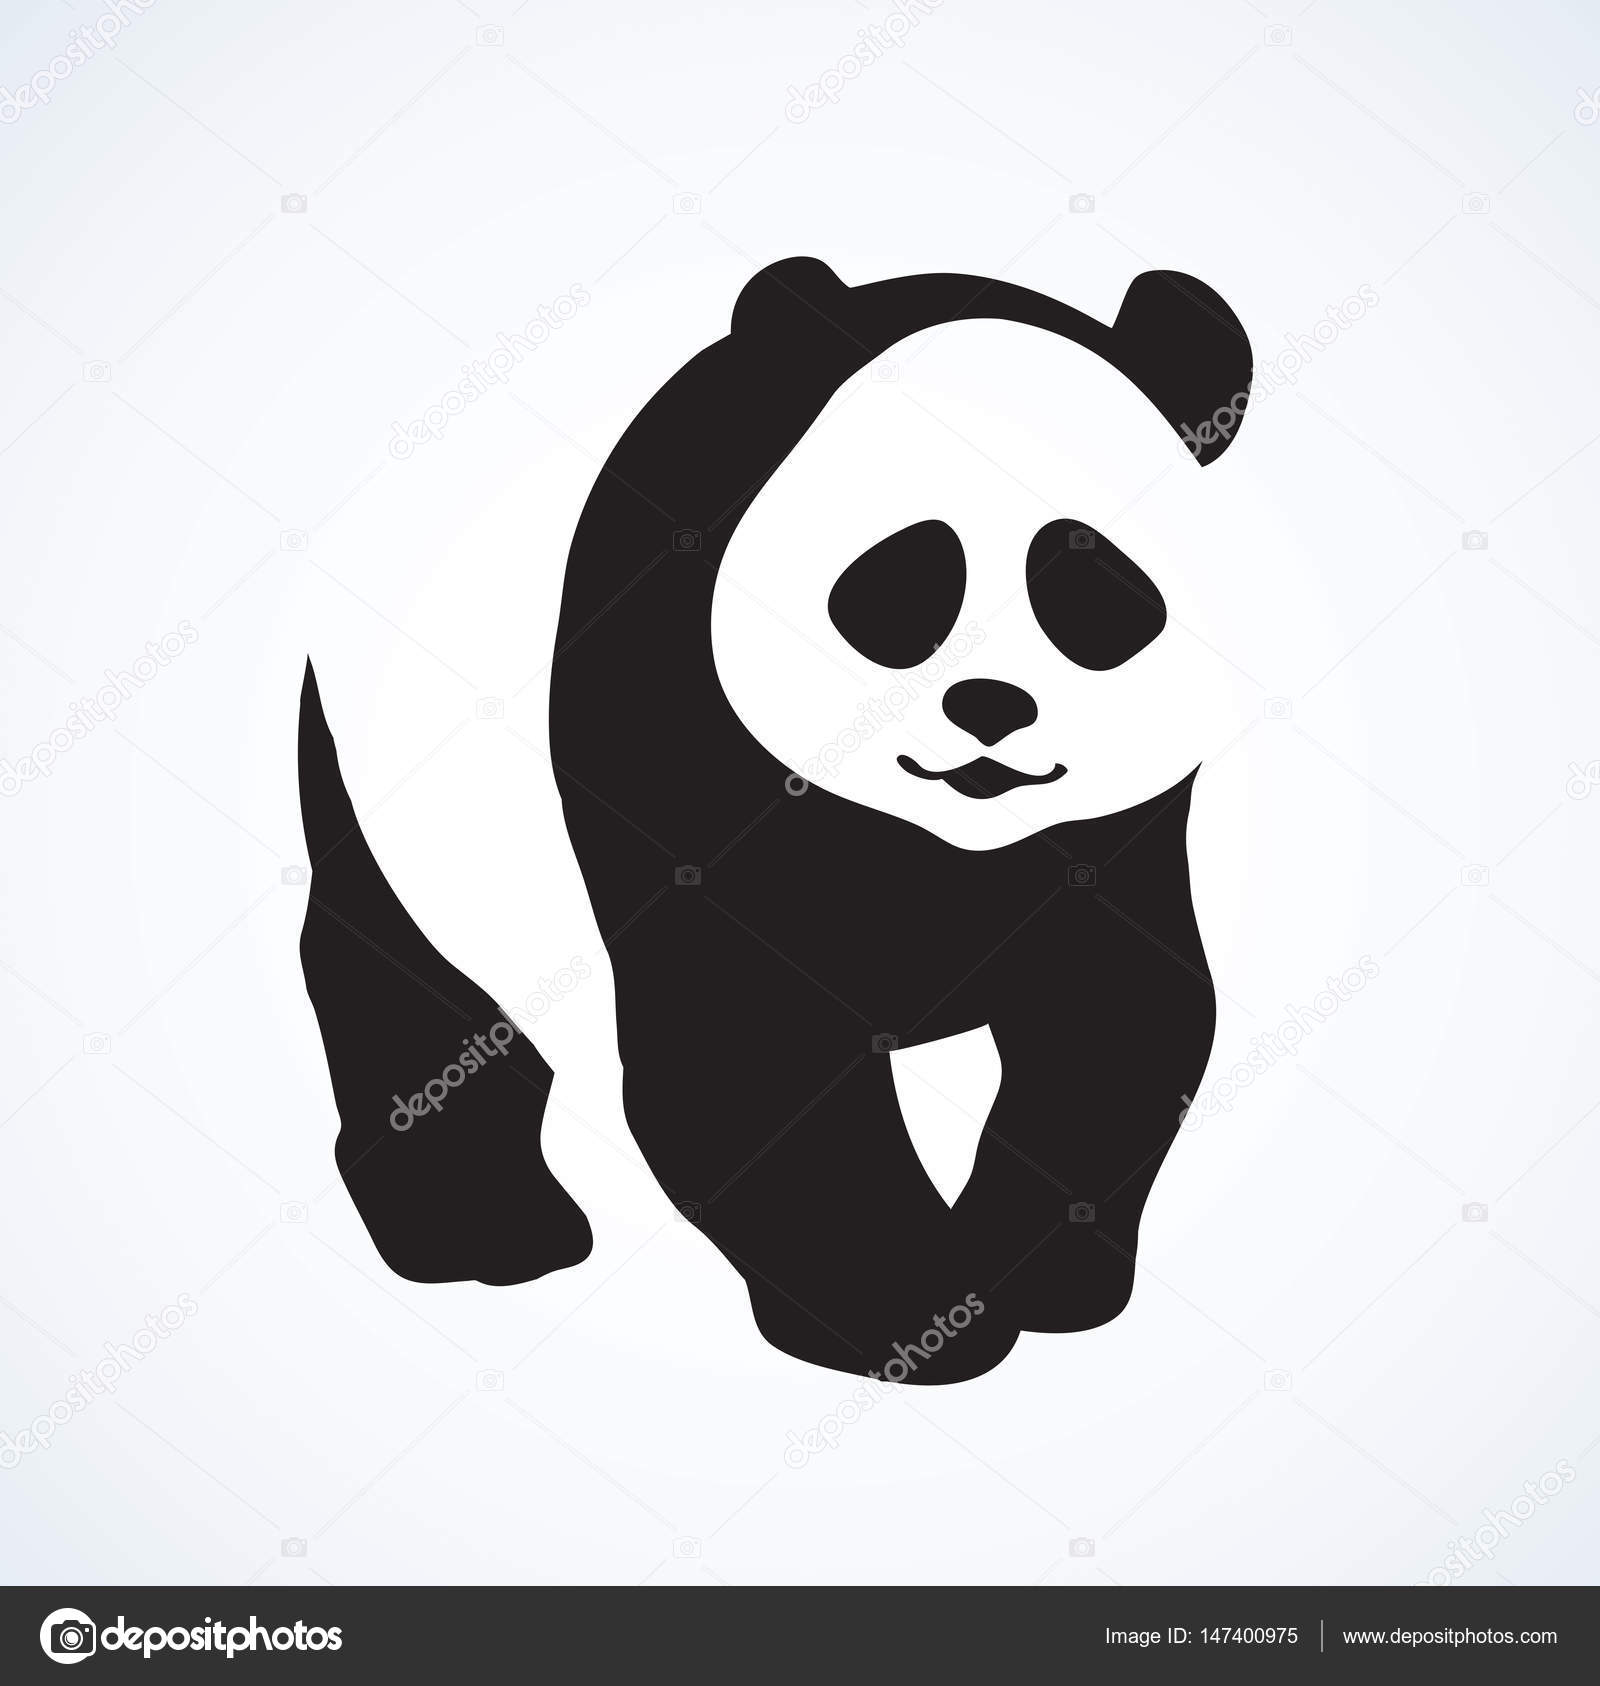 Panda Dessin Vectoriel Image Vectorielle Marinka 147400975